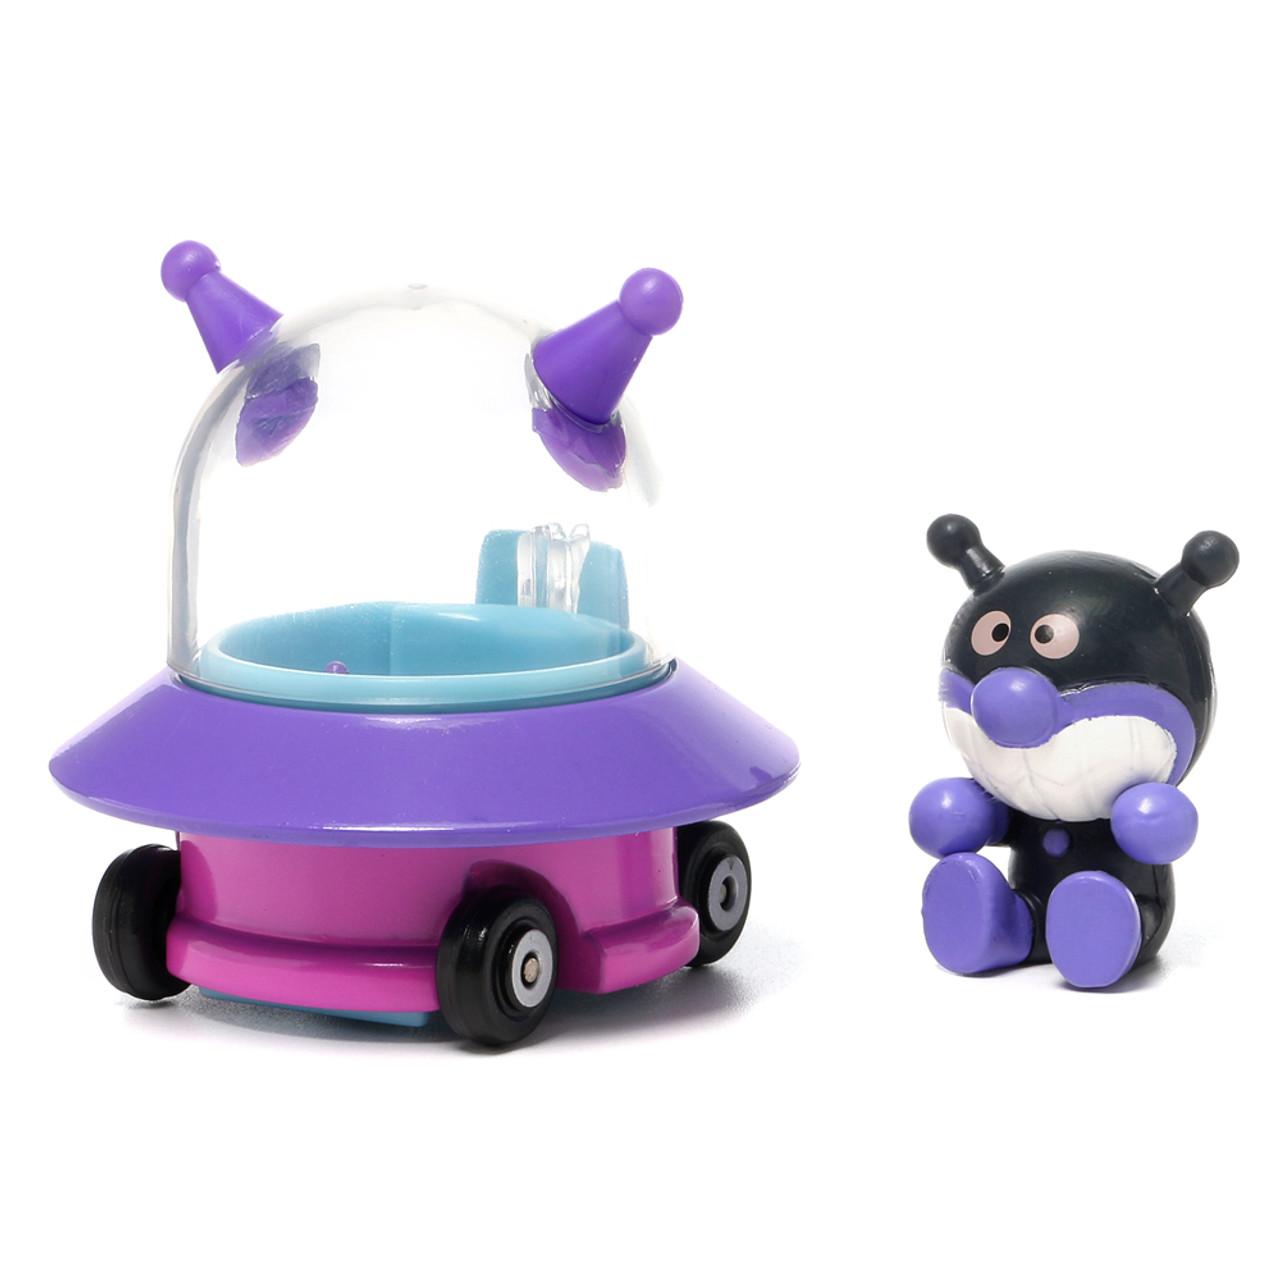 Sega Toys Anpanman Museum Go Go Mini Vehicle Carry Hero - Baikinman Germ UFO car ( Baikinman Germ Front )